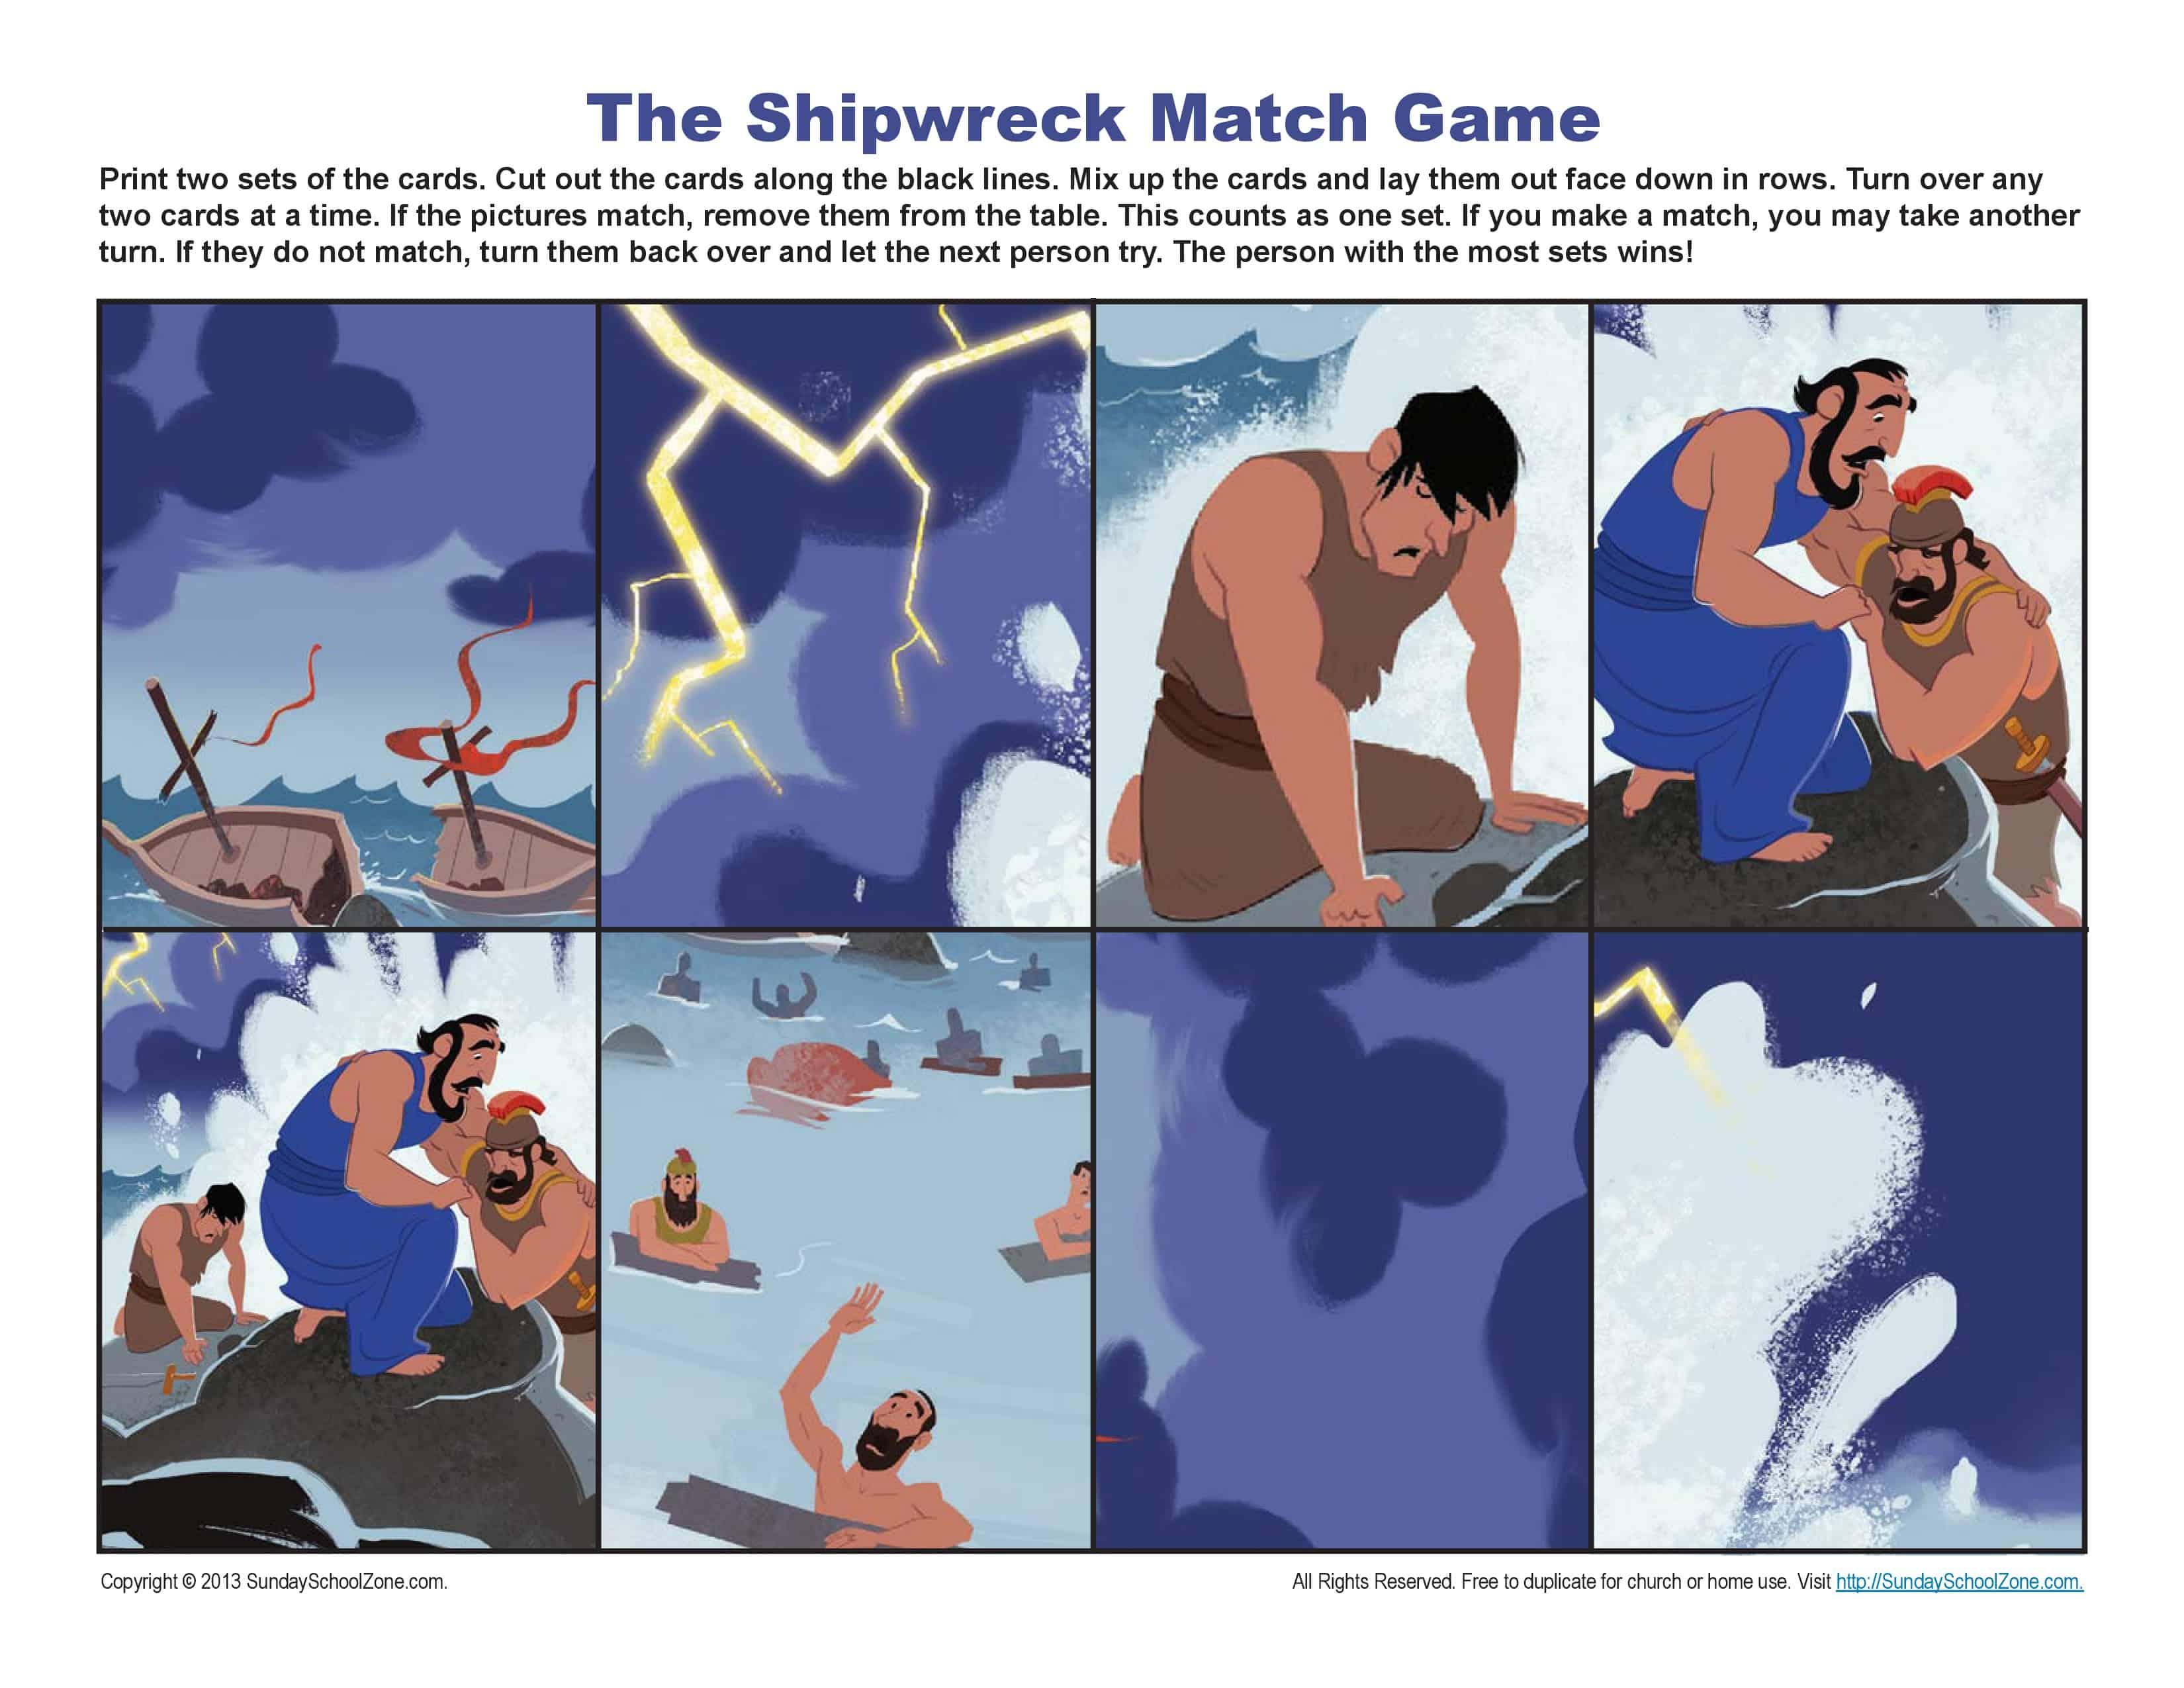 Paul S Shipwreck Match Game Sunday School Activities